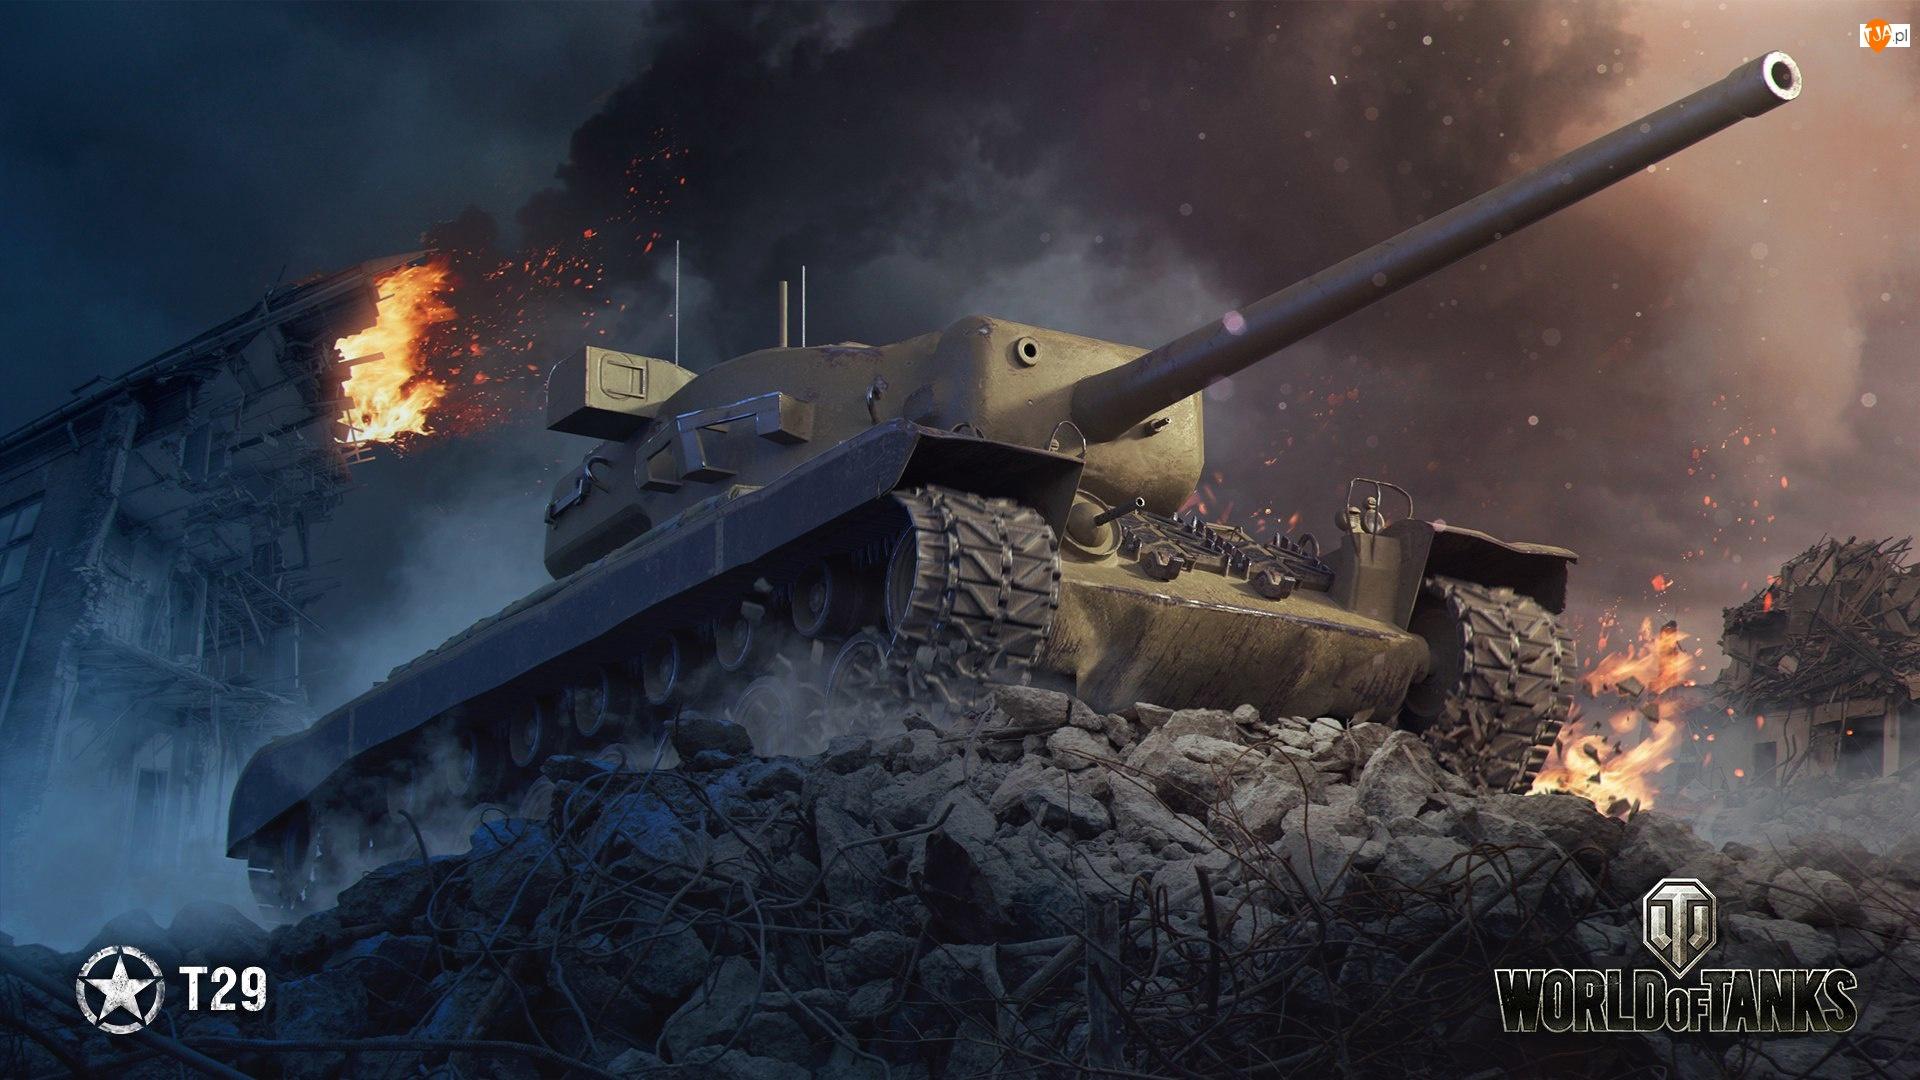 Ruiny, Gra, World of Tanks, Czołg T29